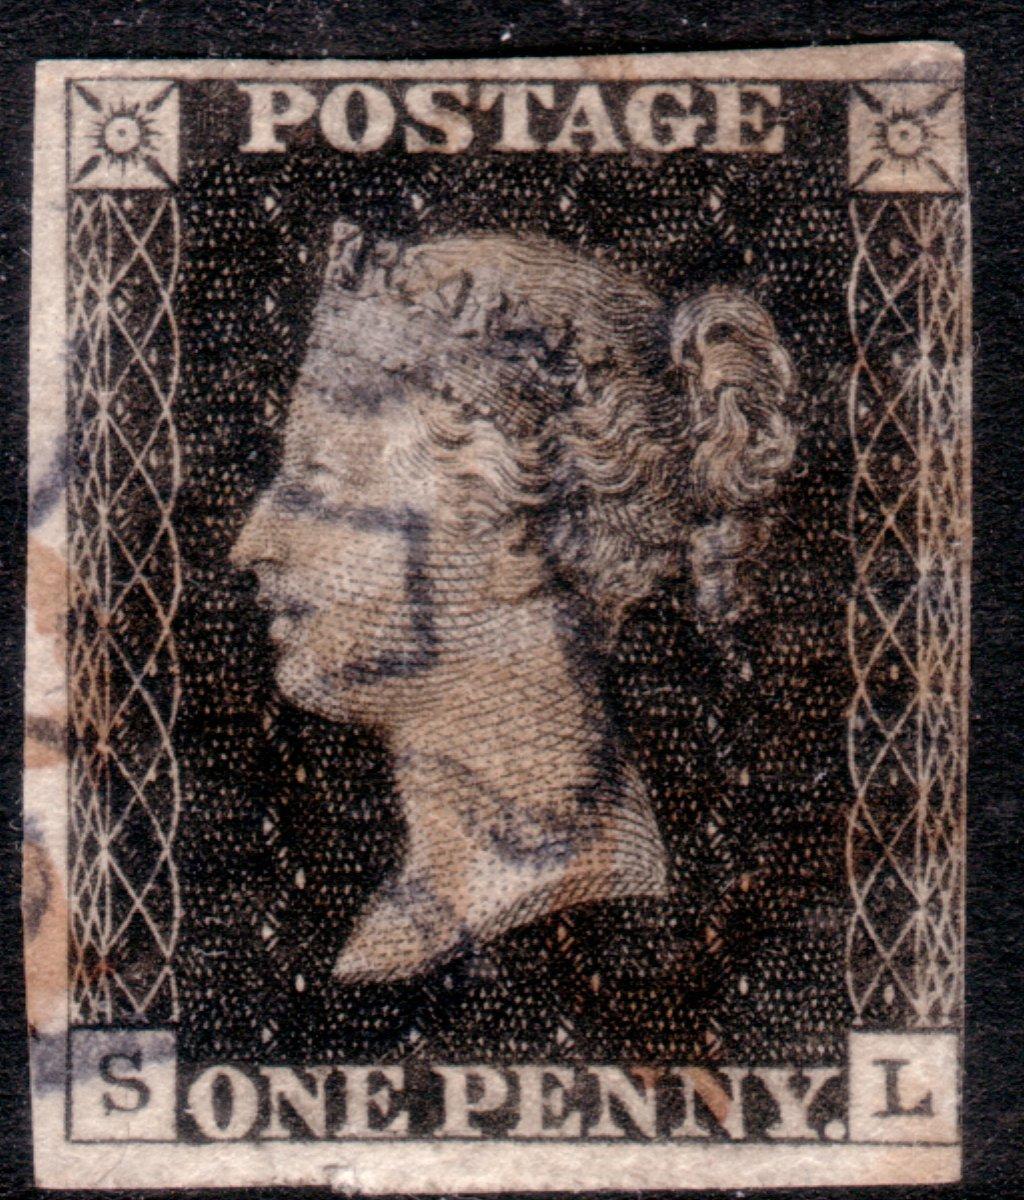 1840 1d Black Plate 6 with Blue-black & Red Maltese Crosses